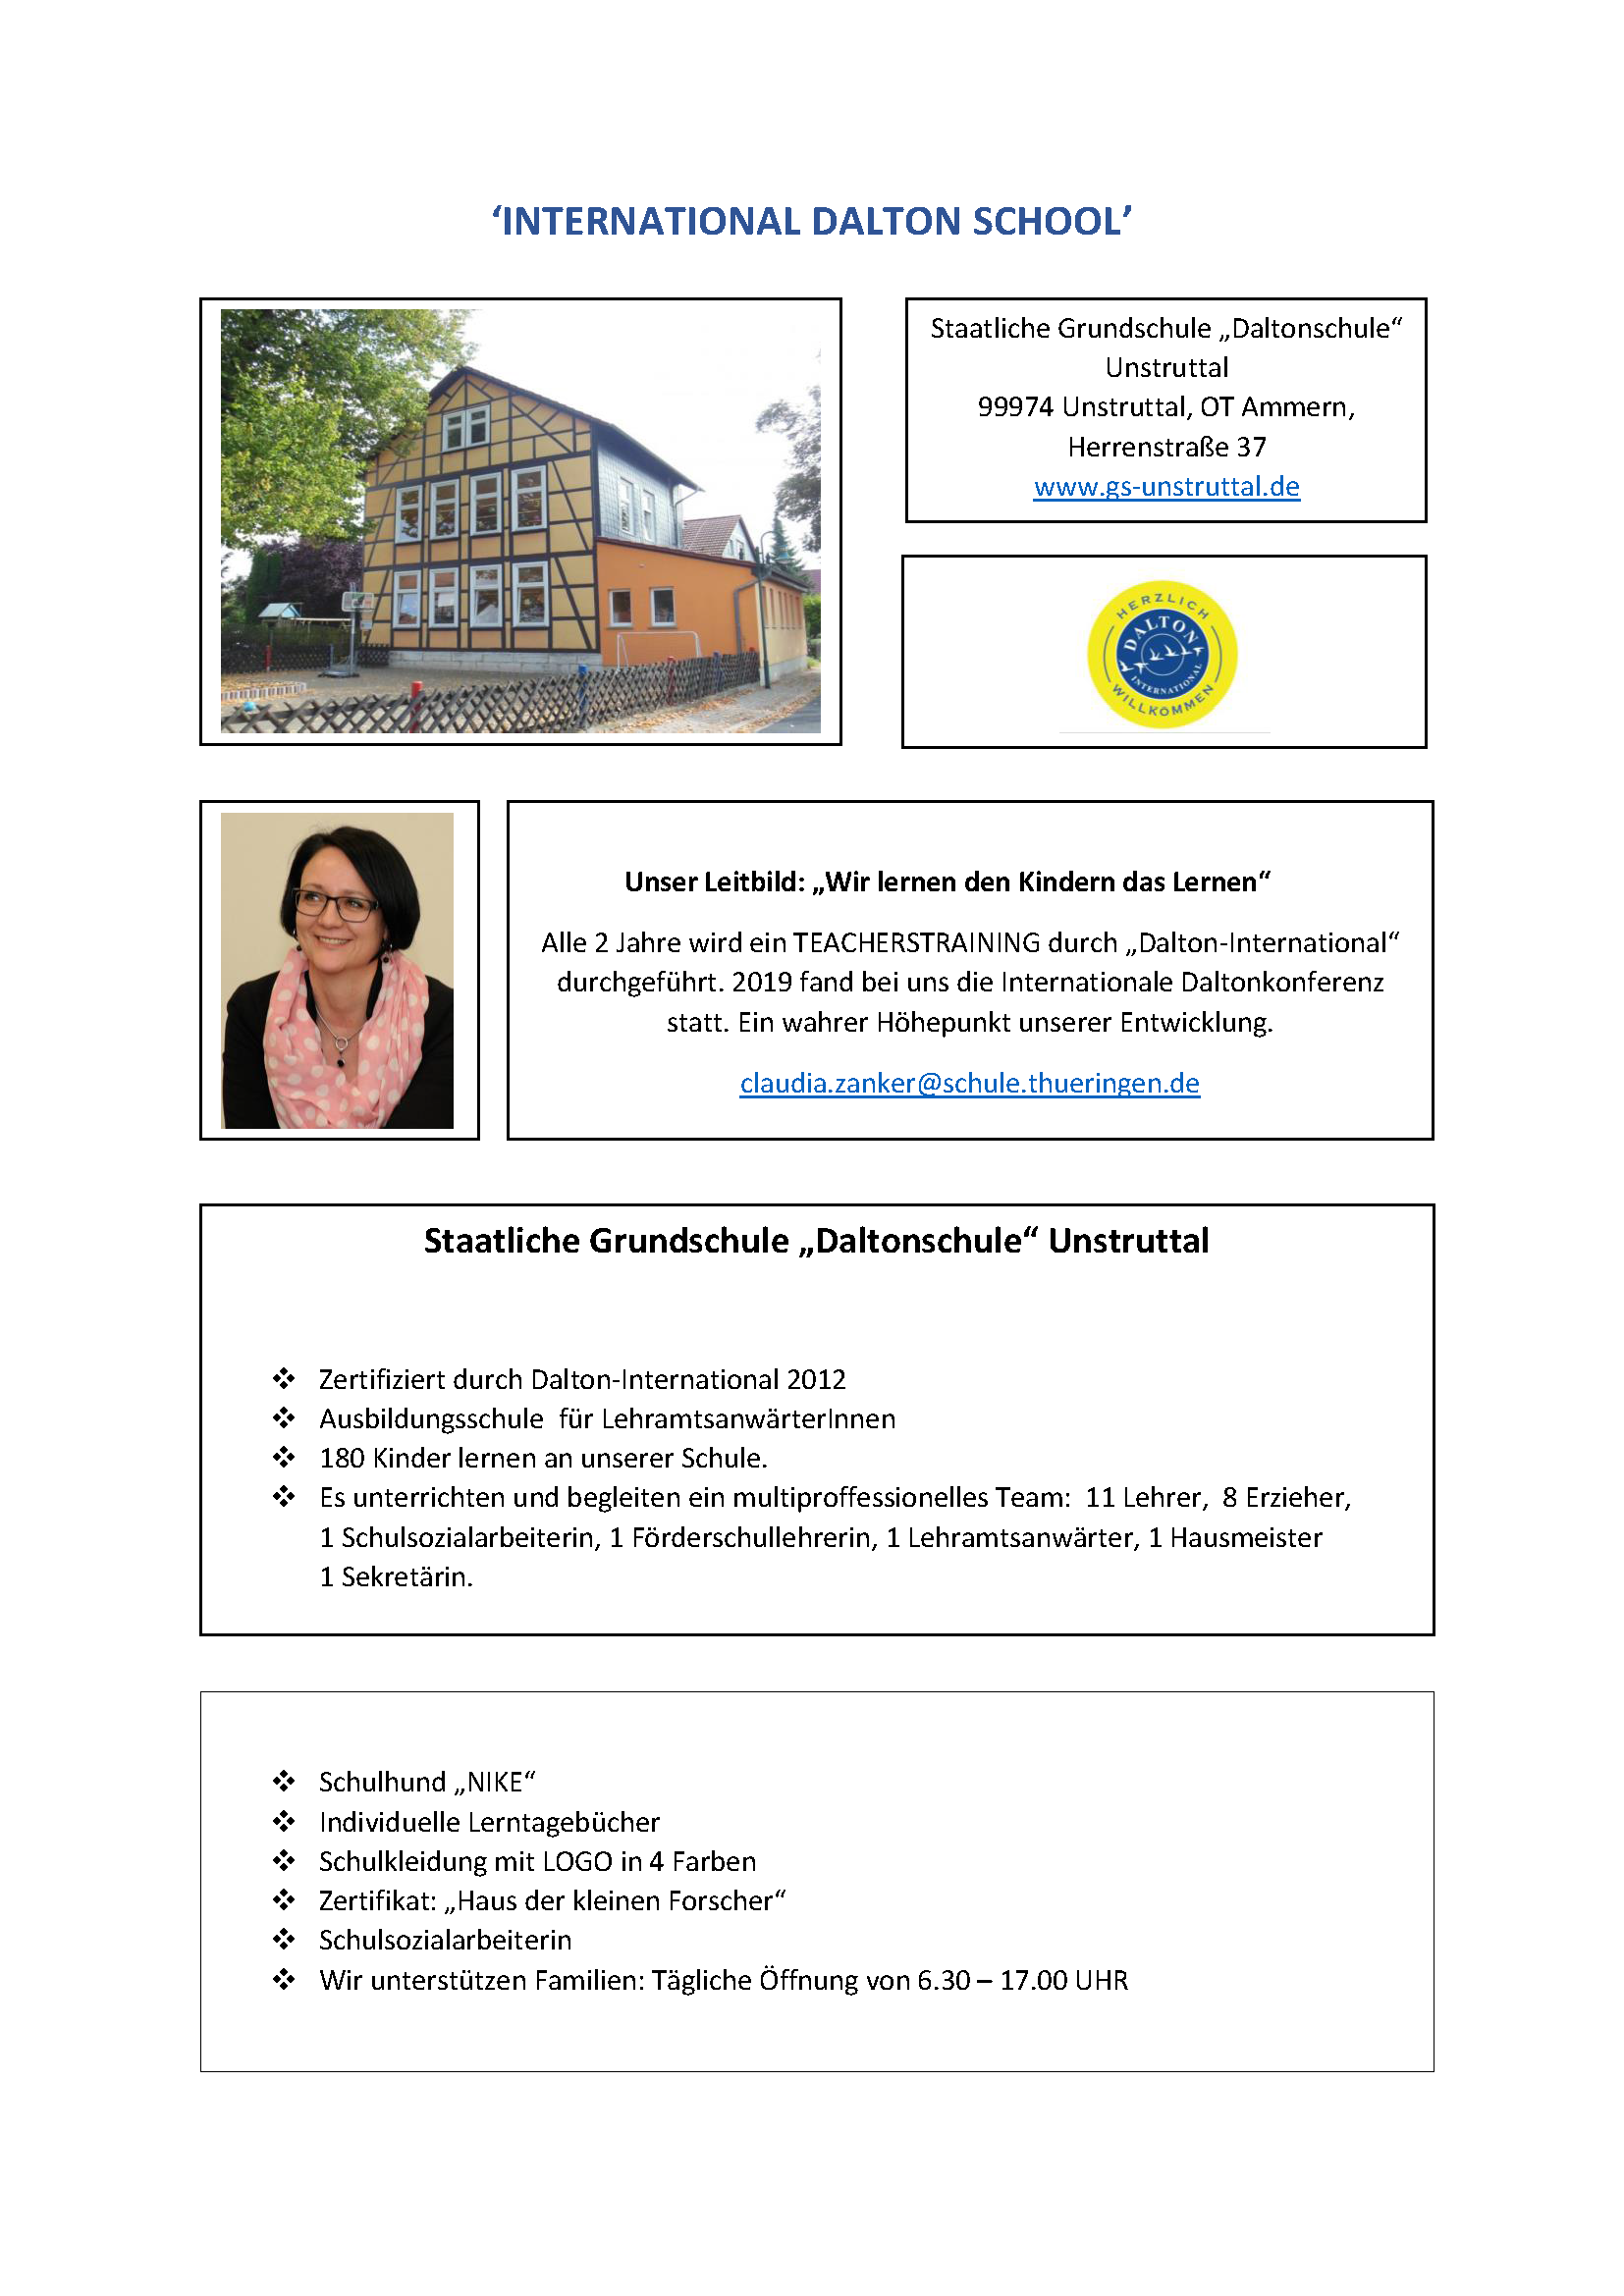 Unstruttal AS 'INTERNATIONAL DALTON SCHOOL'